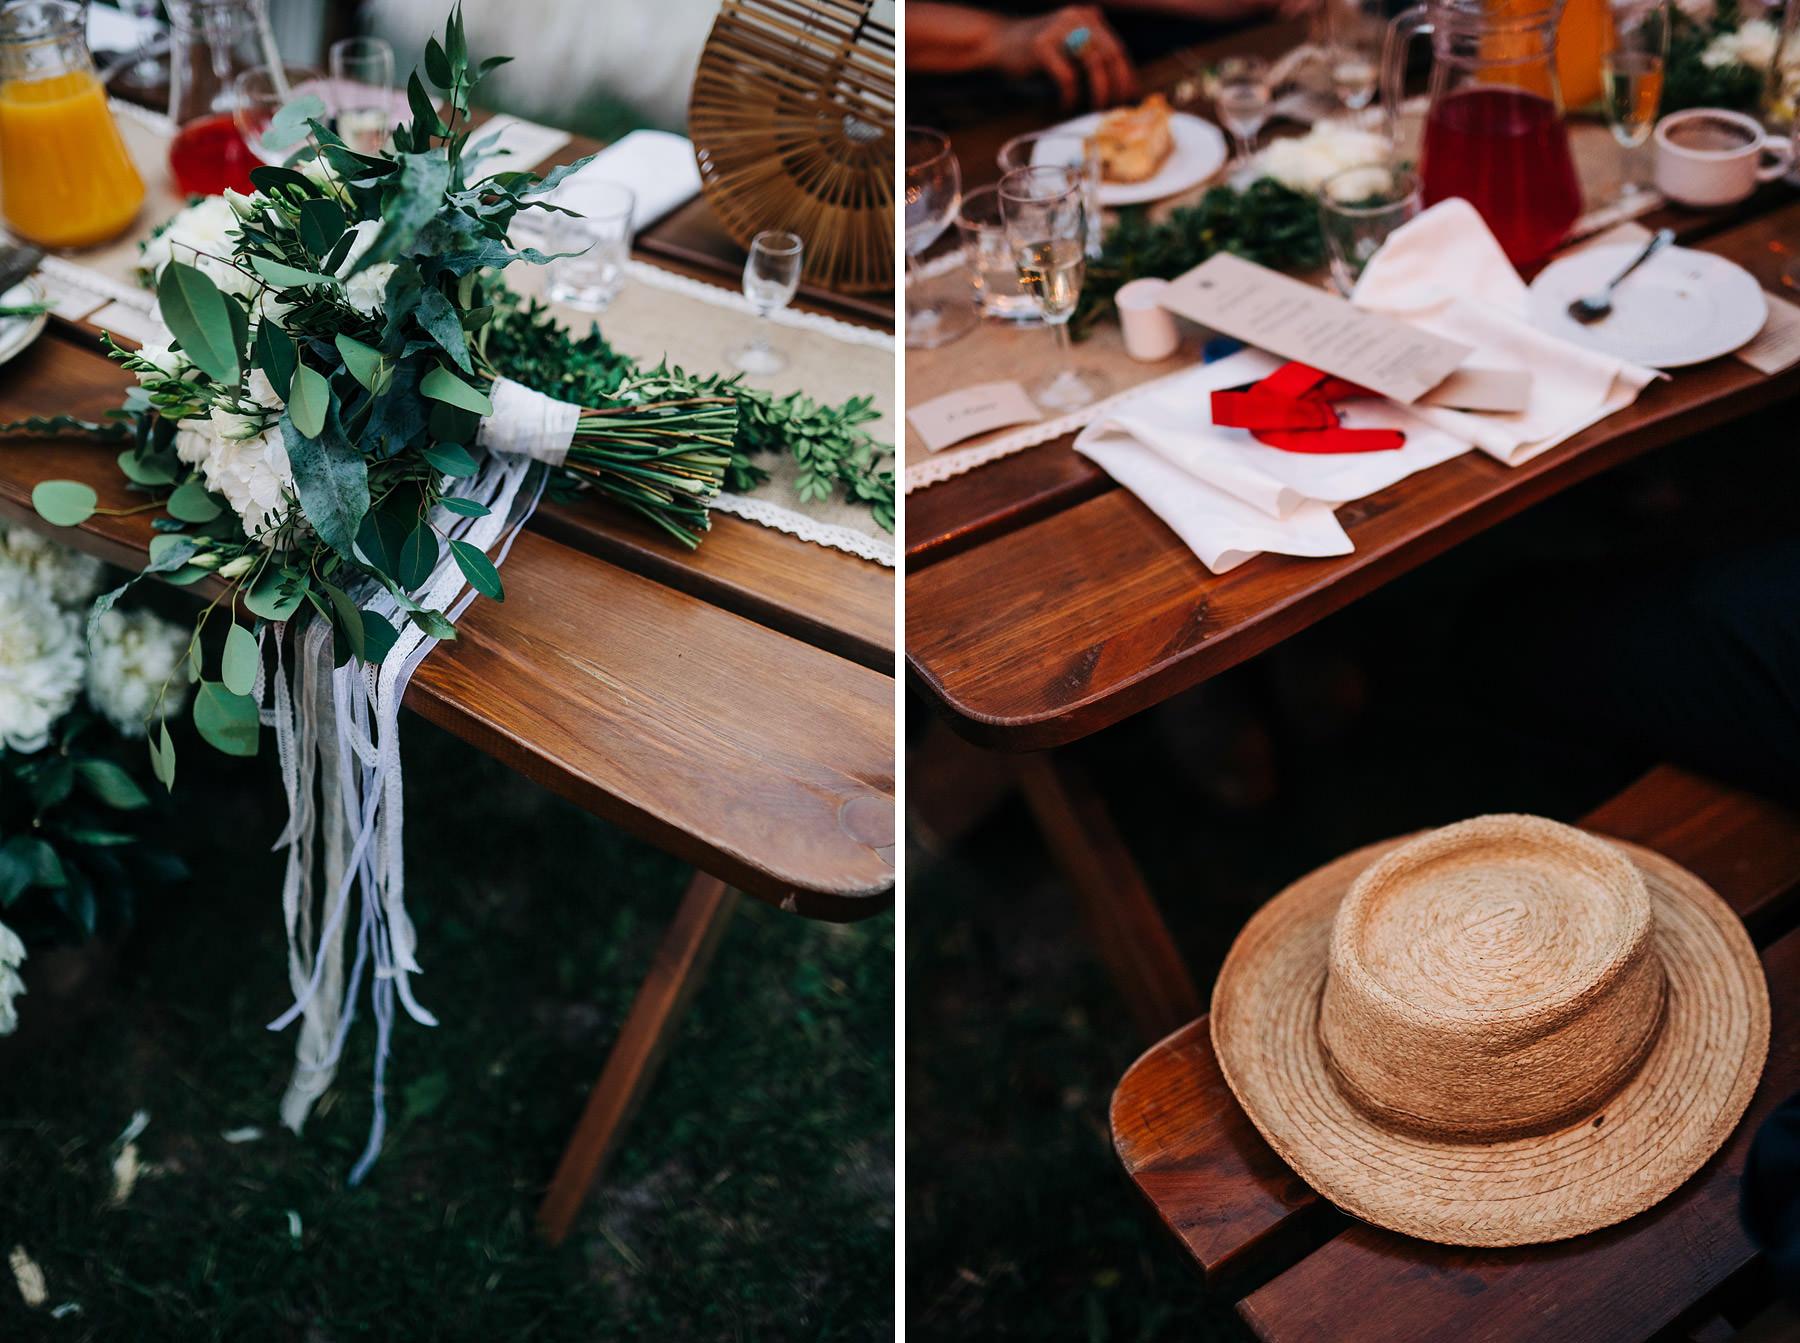 wesele plenerowe dekoracje